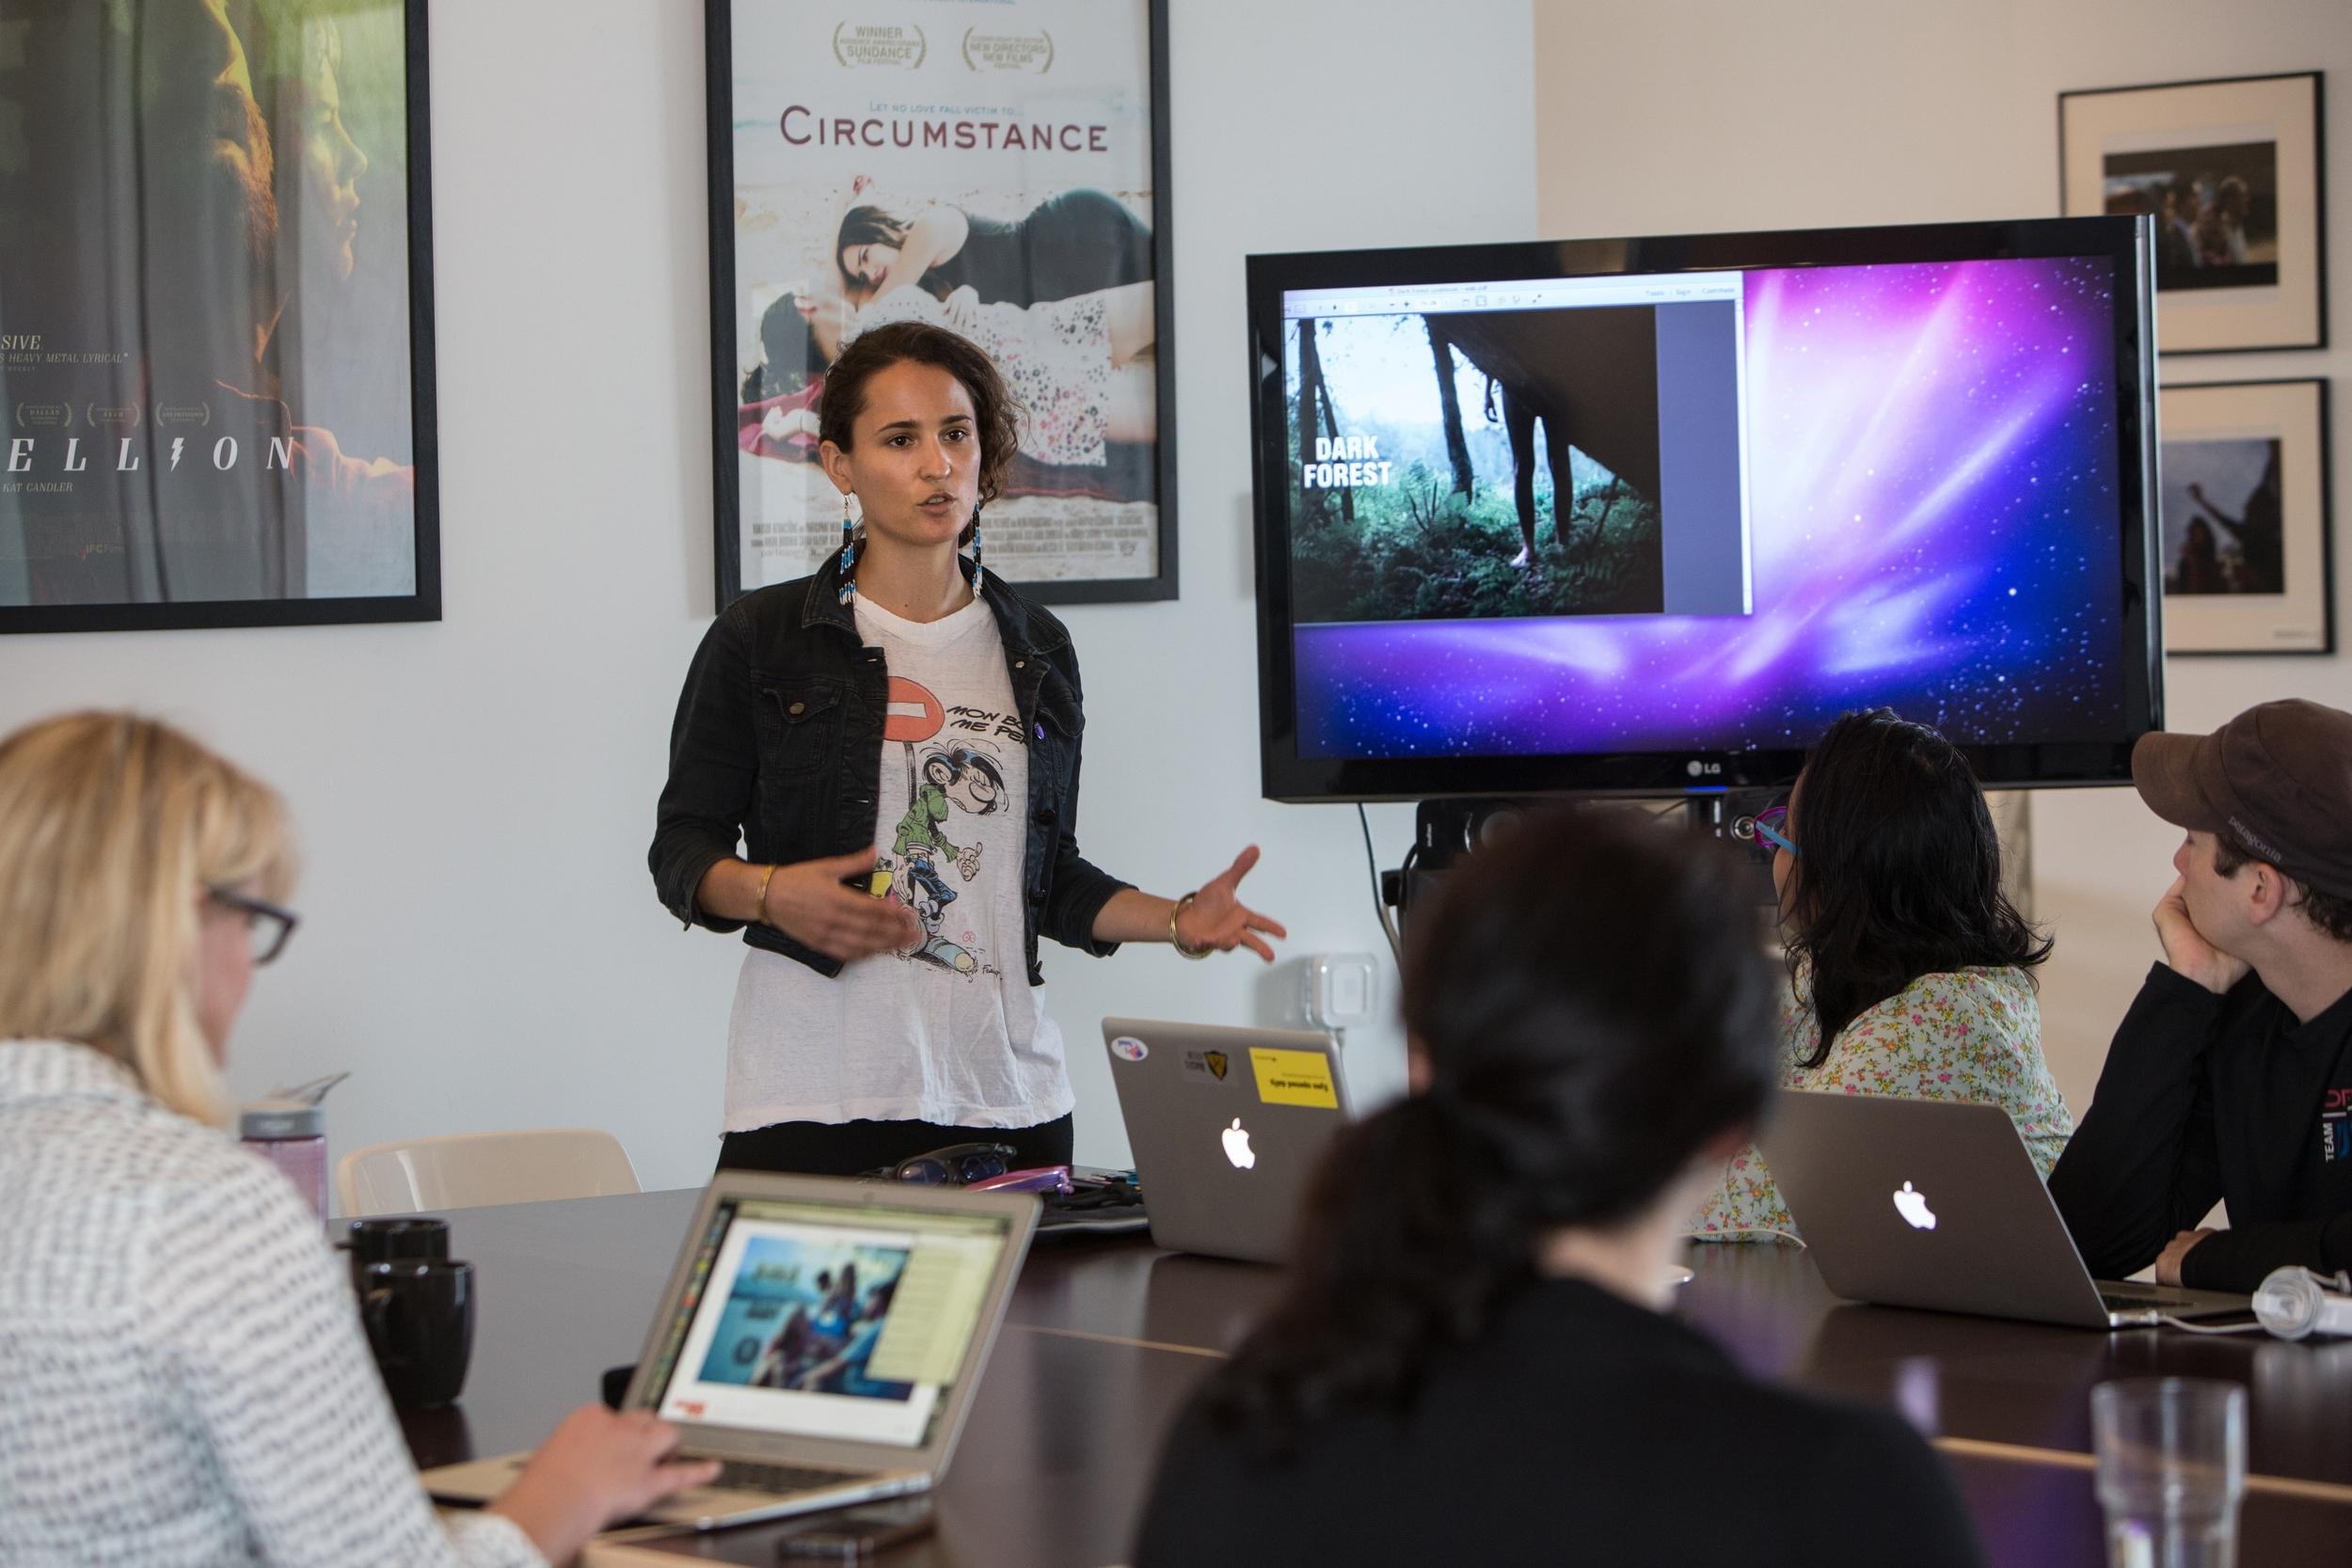 Greenlee presenting on Dark Forest at FilmHouse